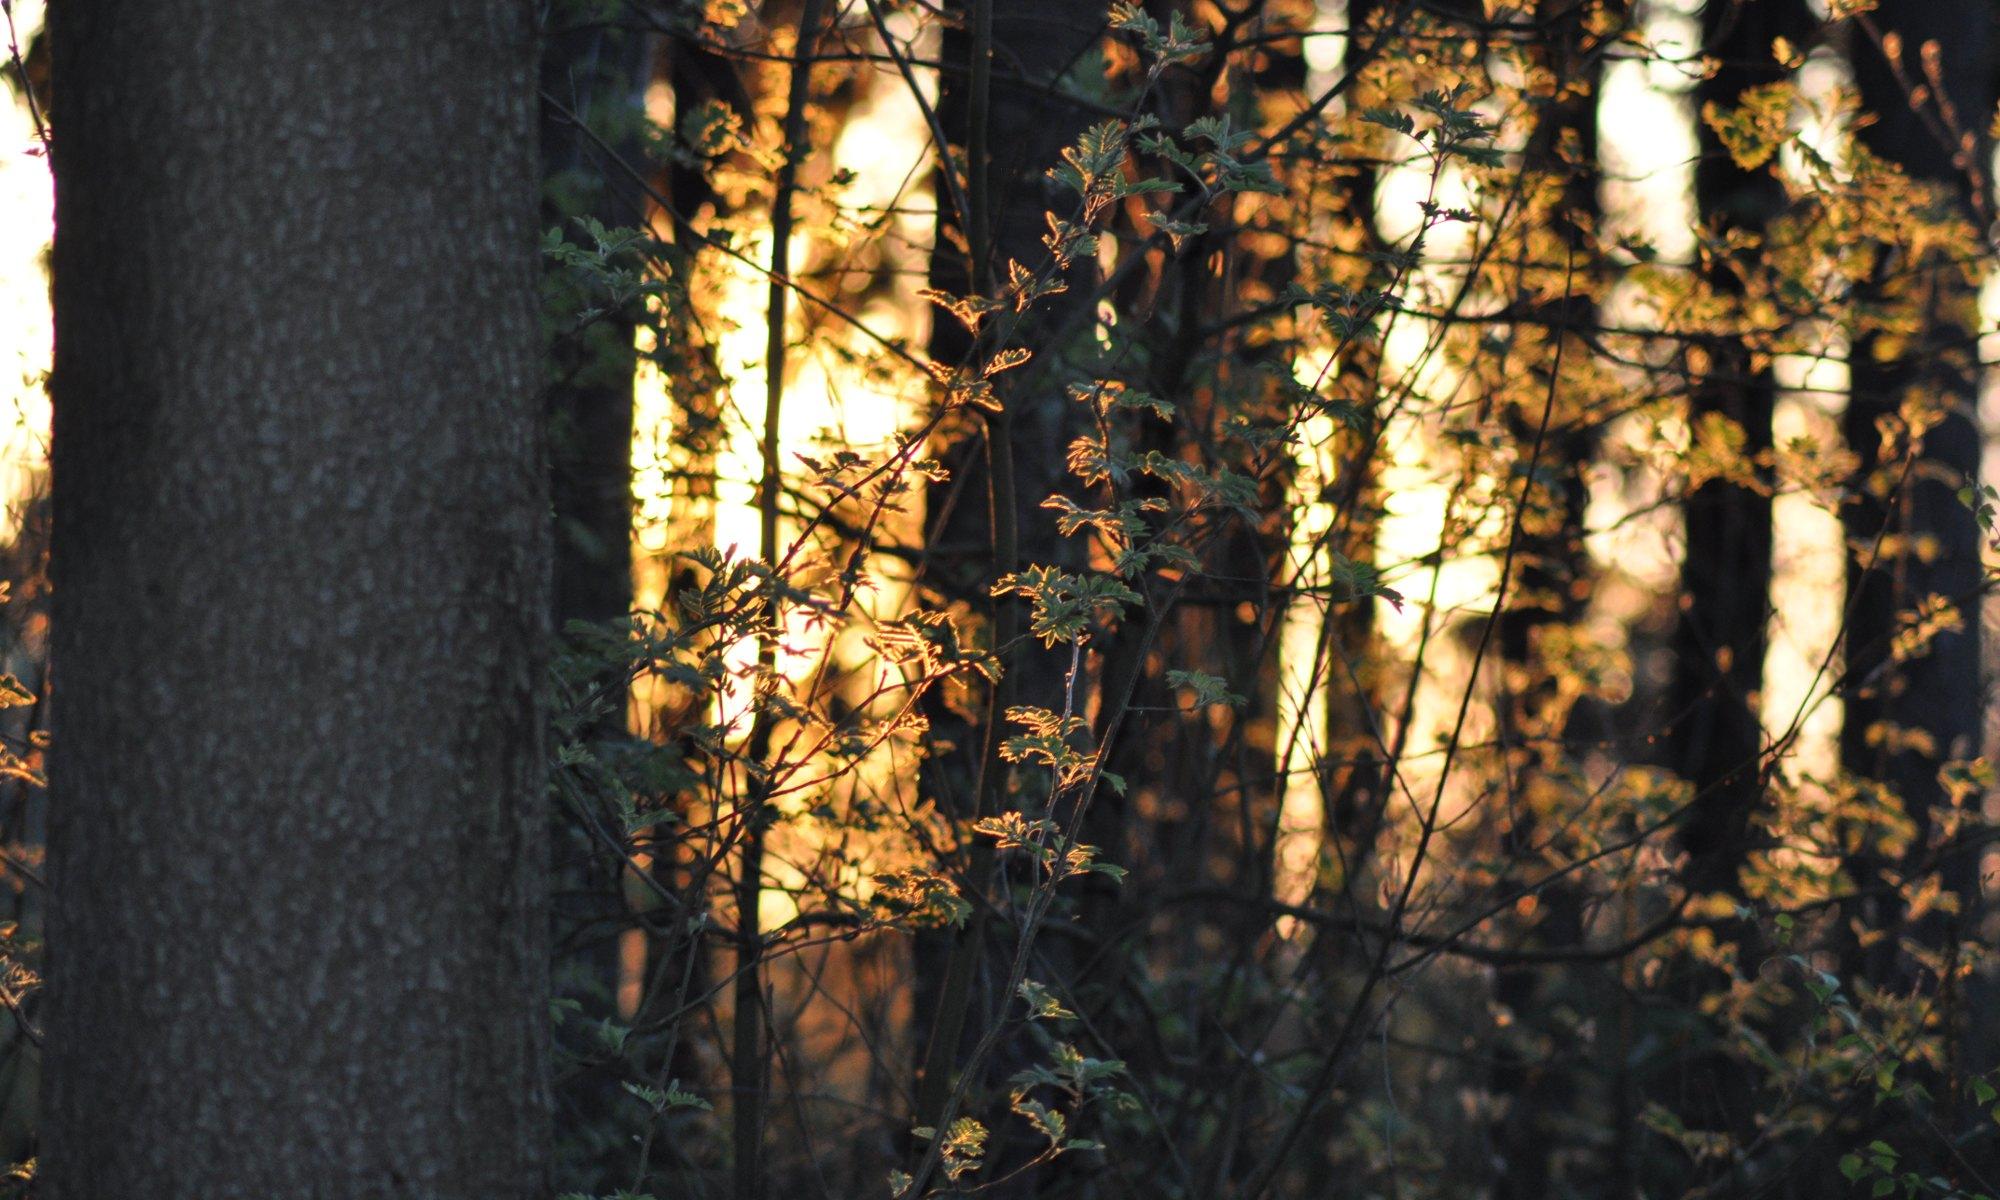 Forstpflege Unger